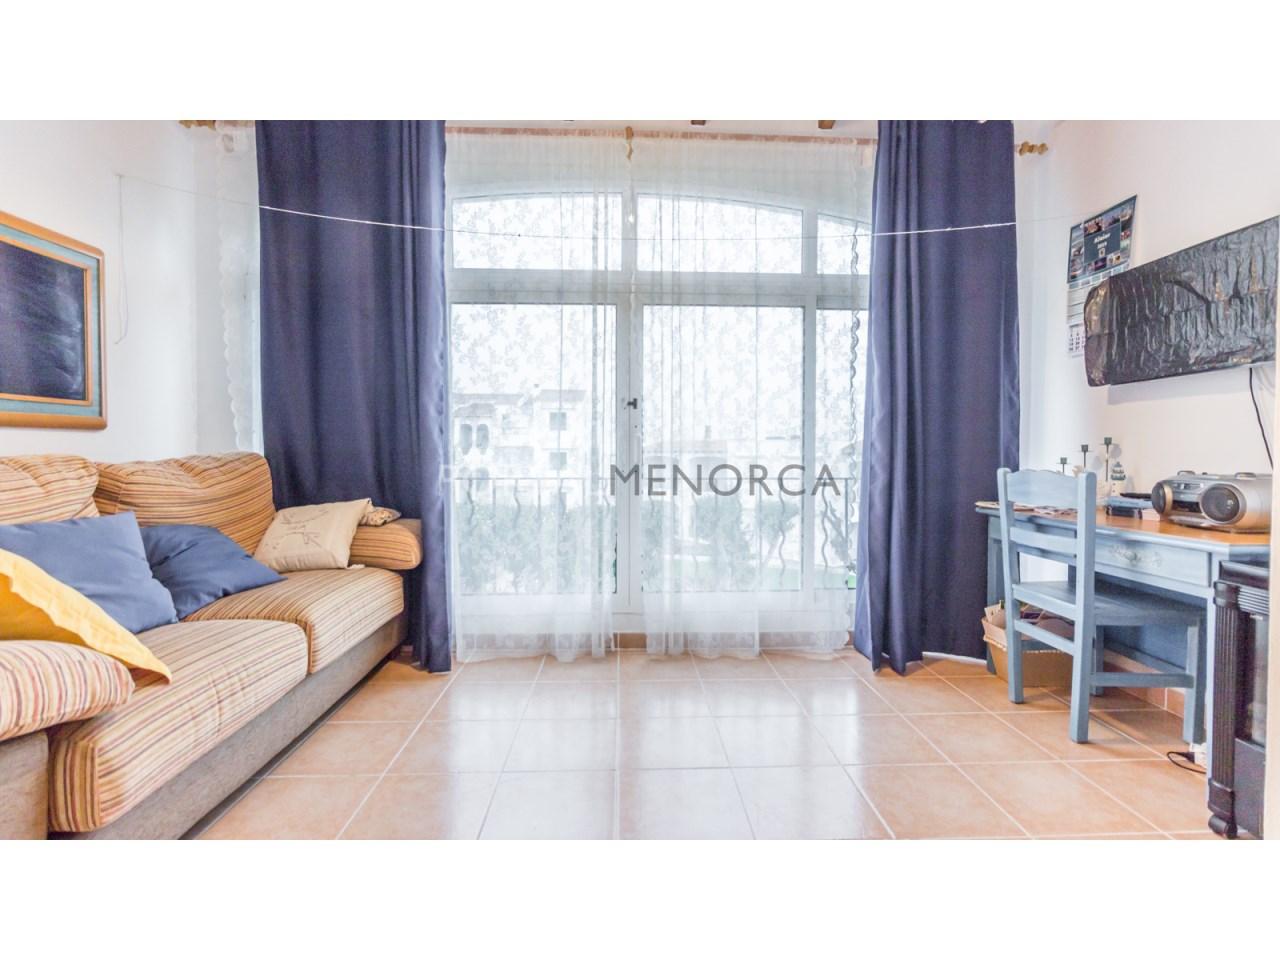 apartament for sale in calan porter menorca (3 de 7)